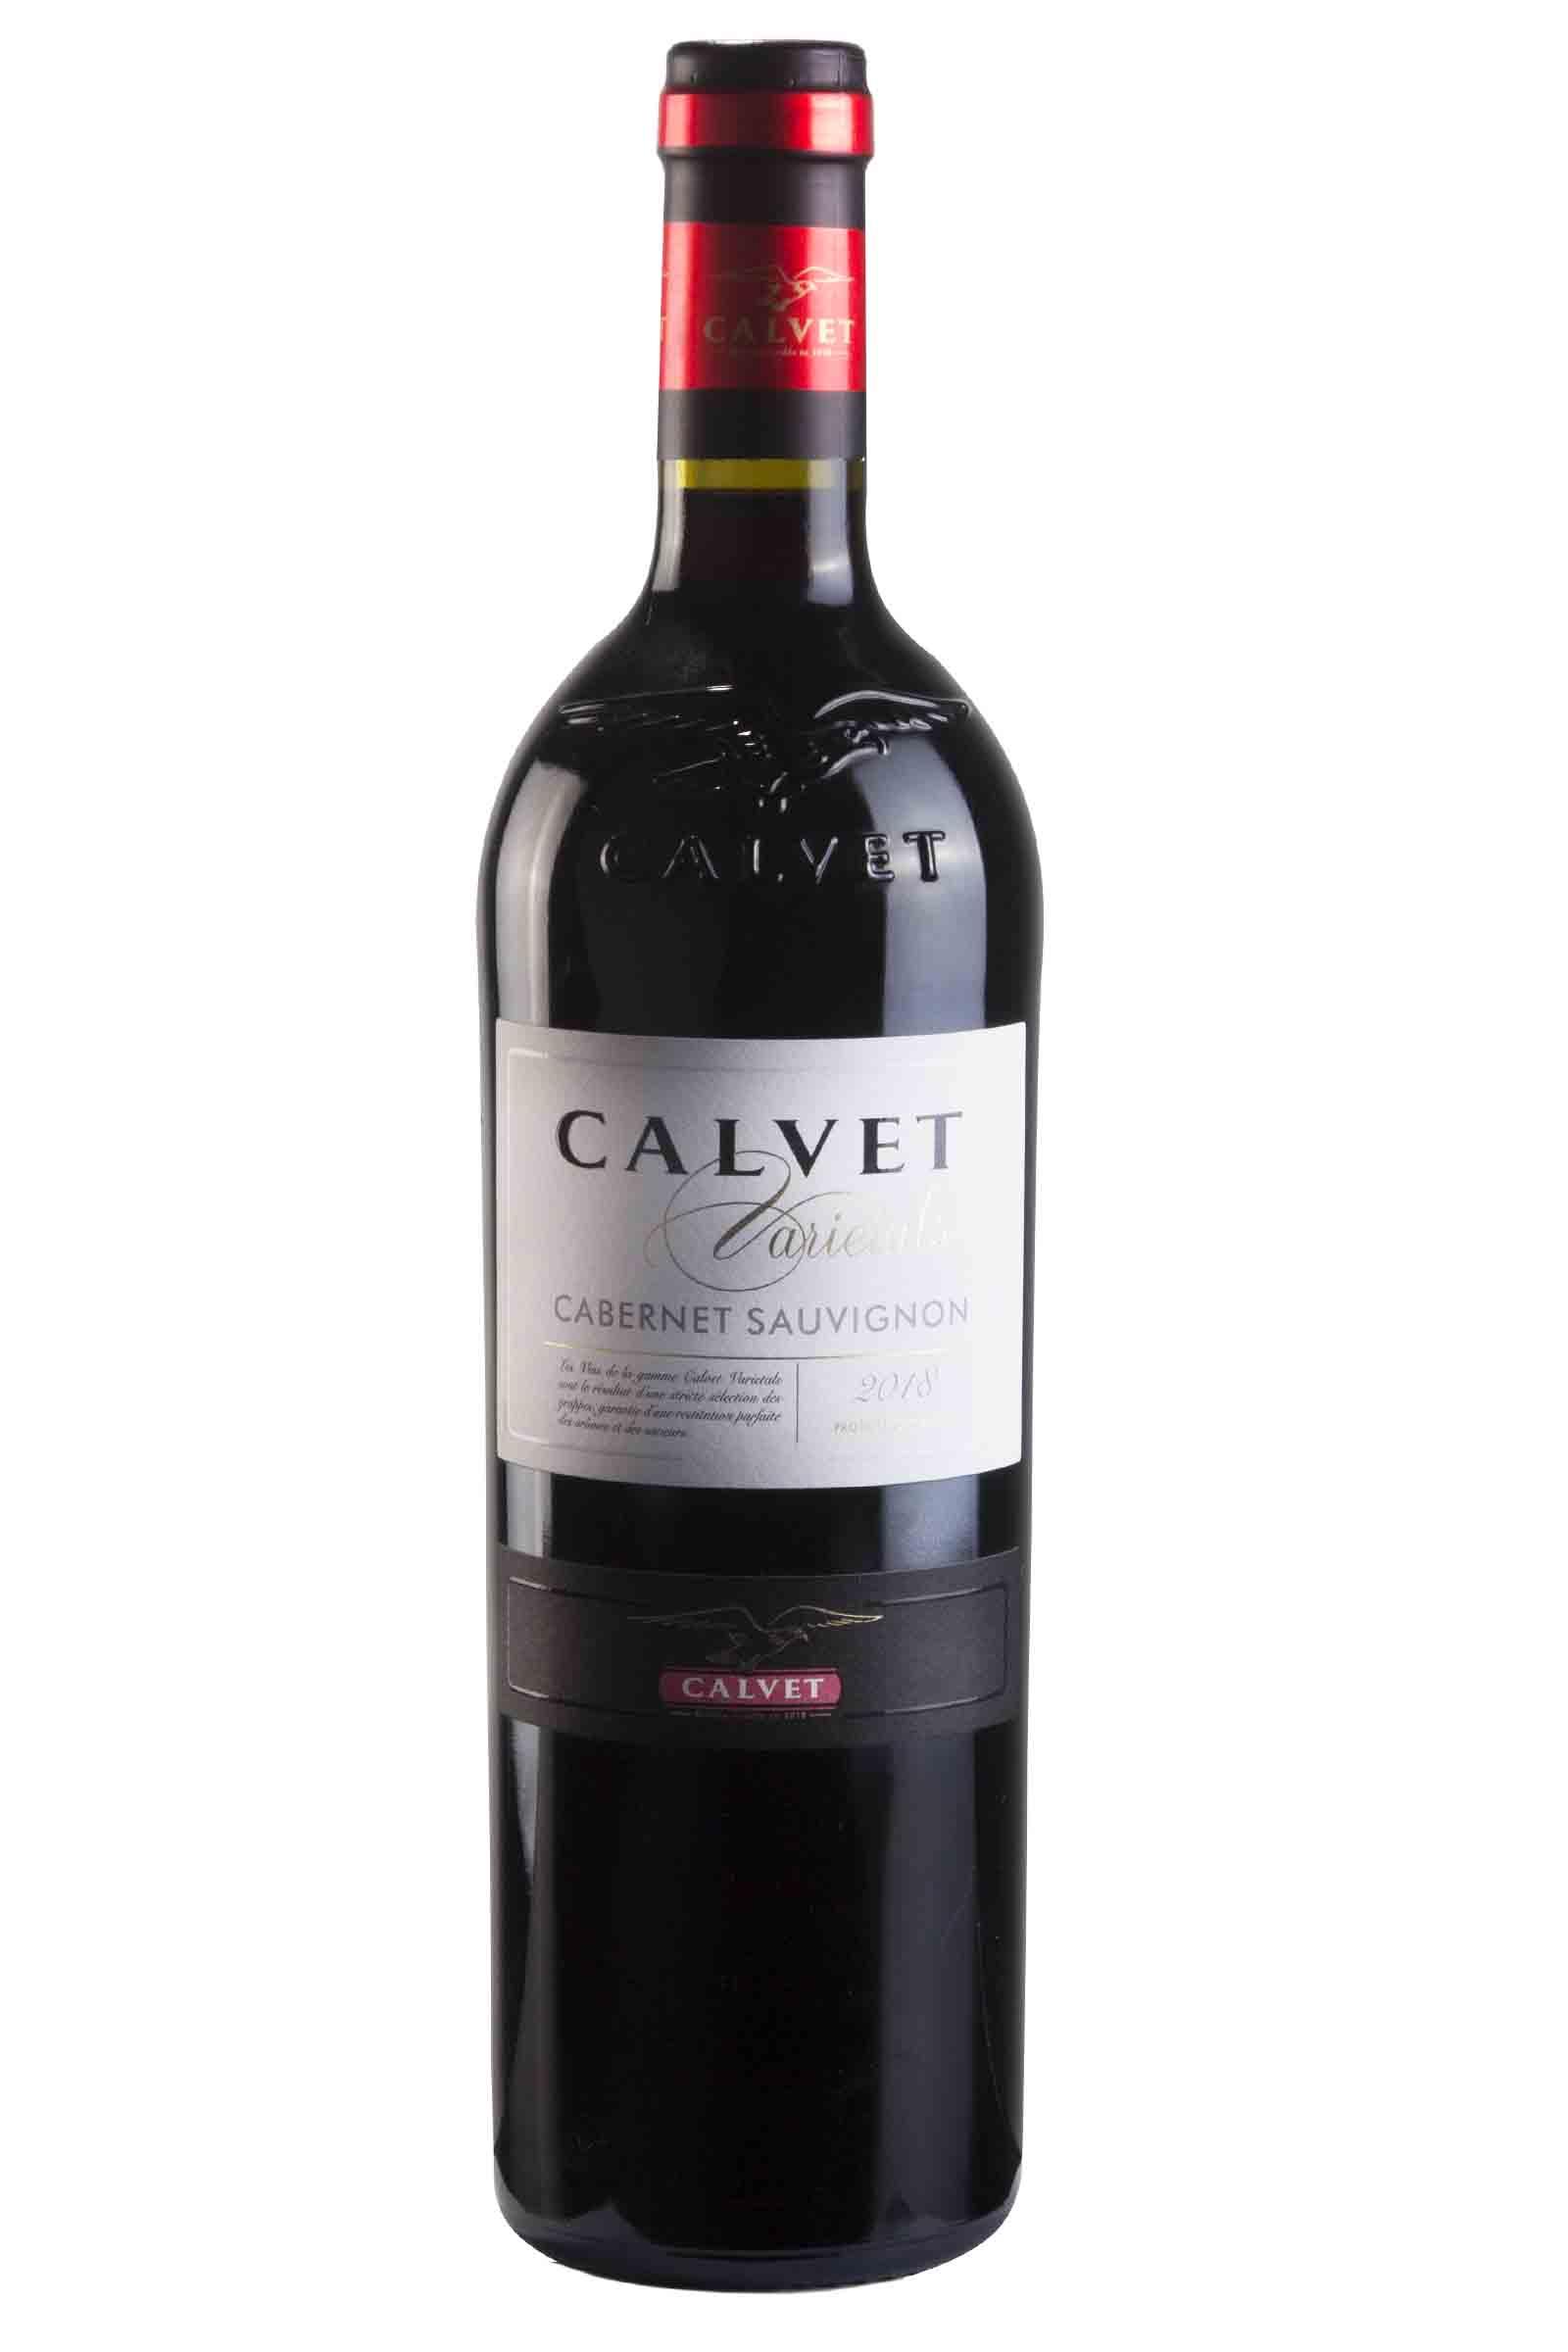 Vino Calvet Varietal Cabernet Sauvignon 750ml